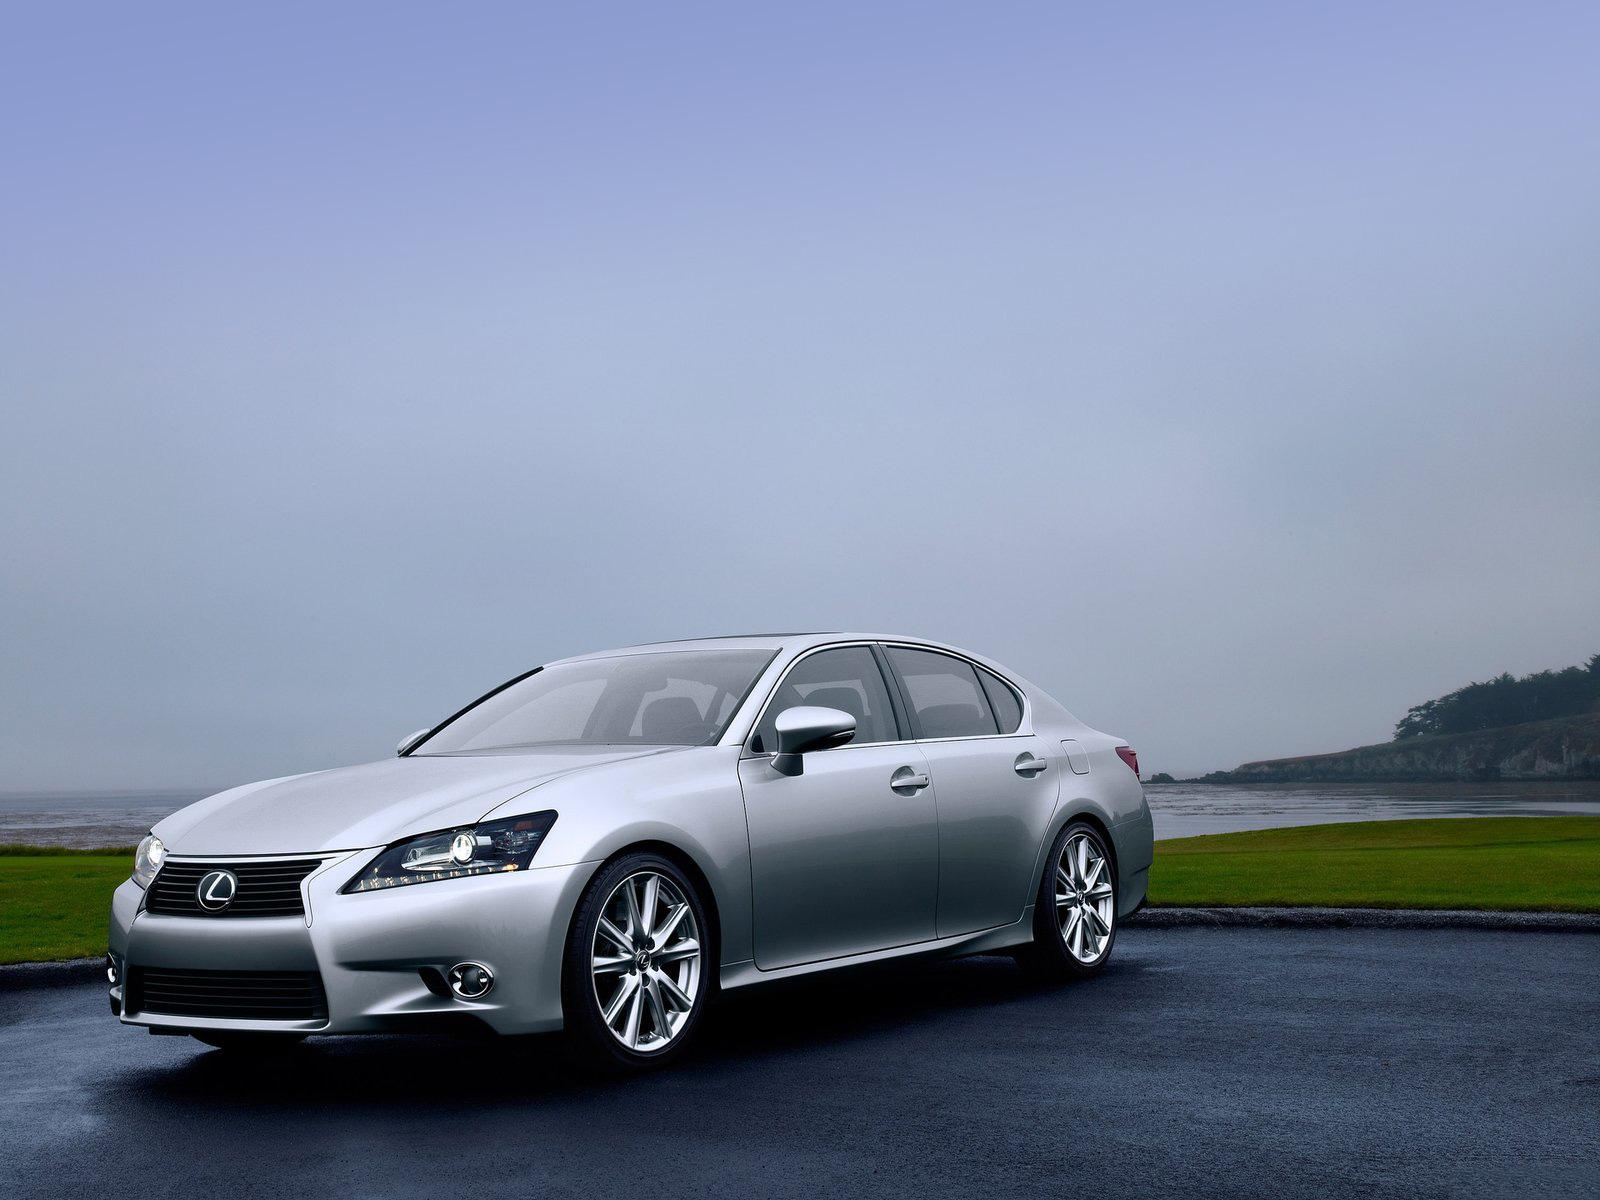 Lexus GS 350 - the new prestigious car